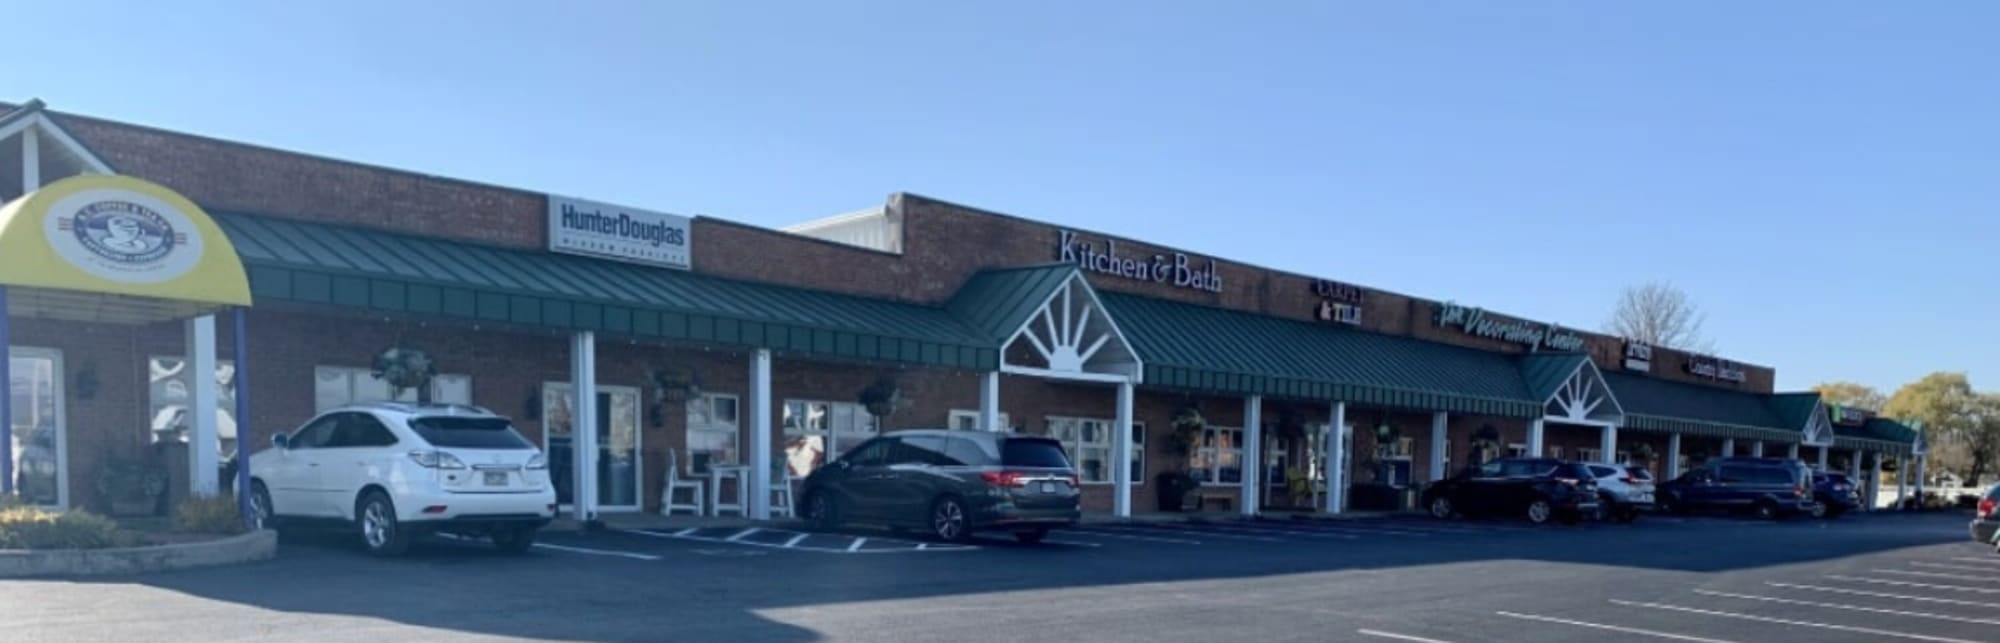 The Decorating Center, Inc. - 3 Cedar Green Center Mifflinburg, PA 17844